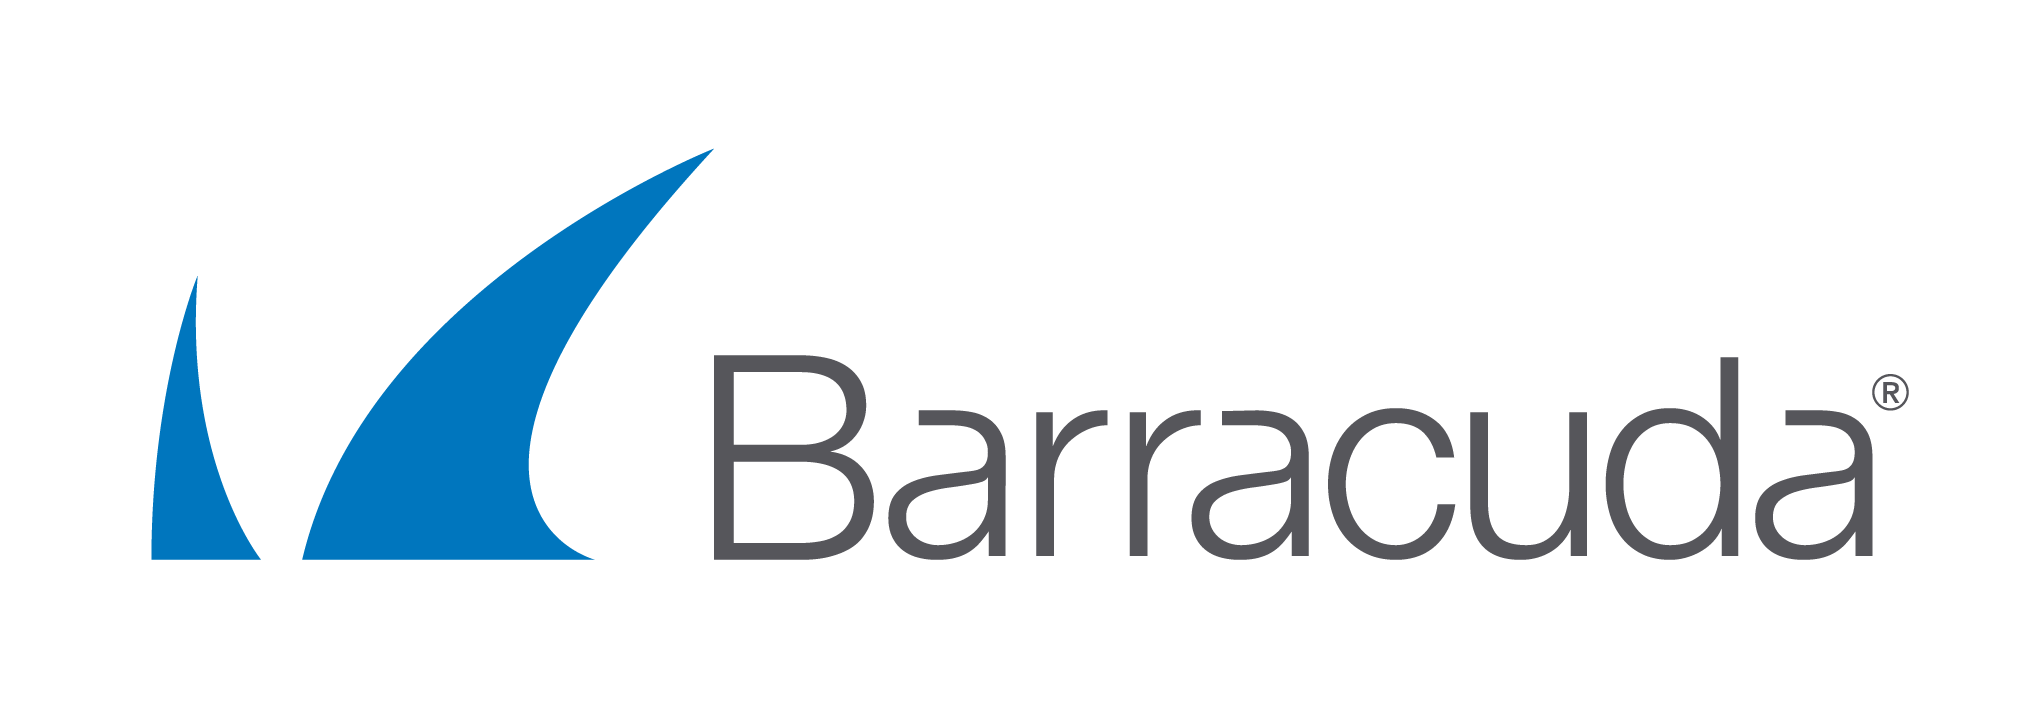 Charlotte, NC certified Barracuda reseller